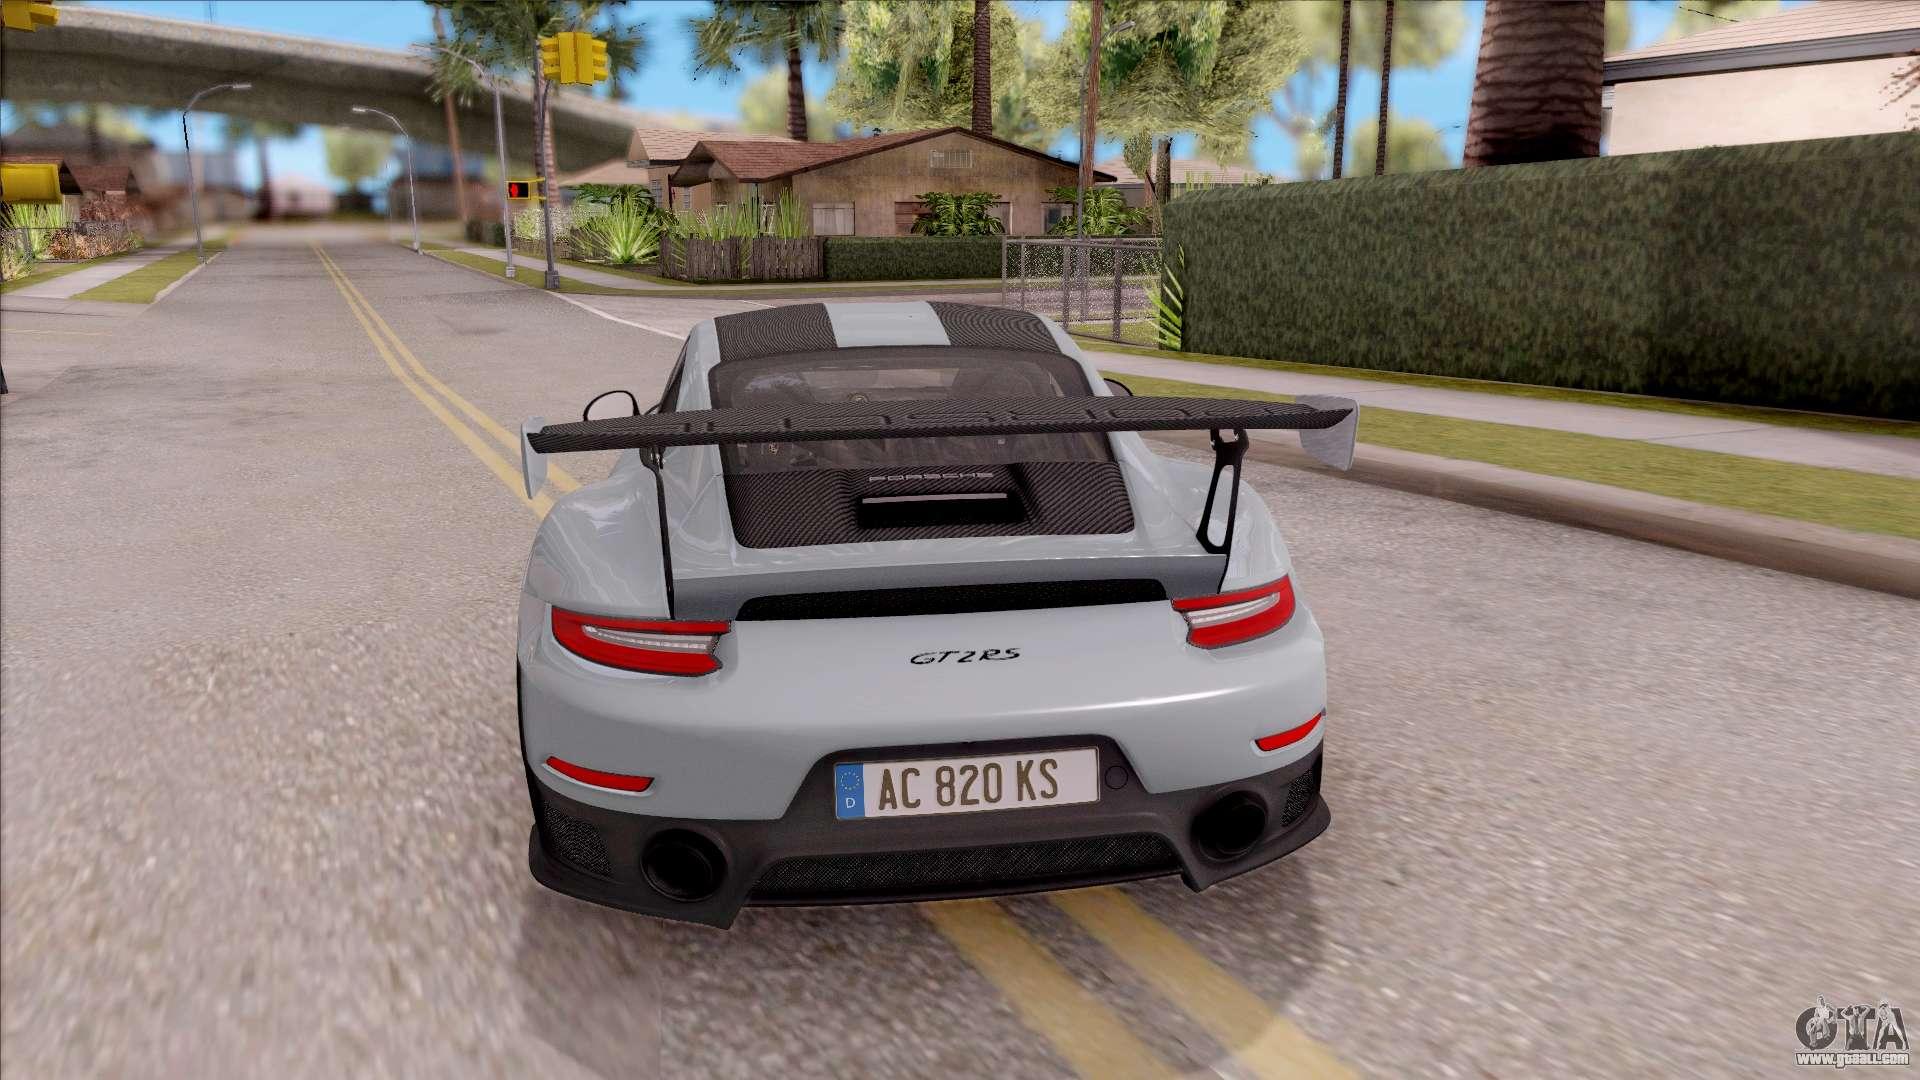 418325-enb2017-7-10-5-14-58 Stunning Porsche 911 Gt2 Rs Vs Lamborghini Aventador Cars Trend